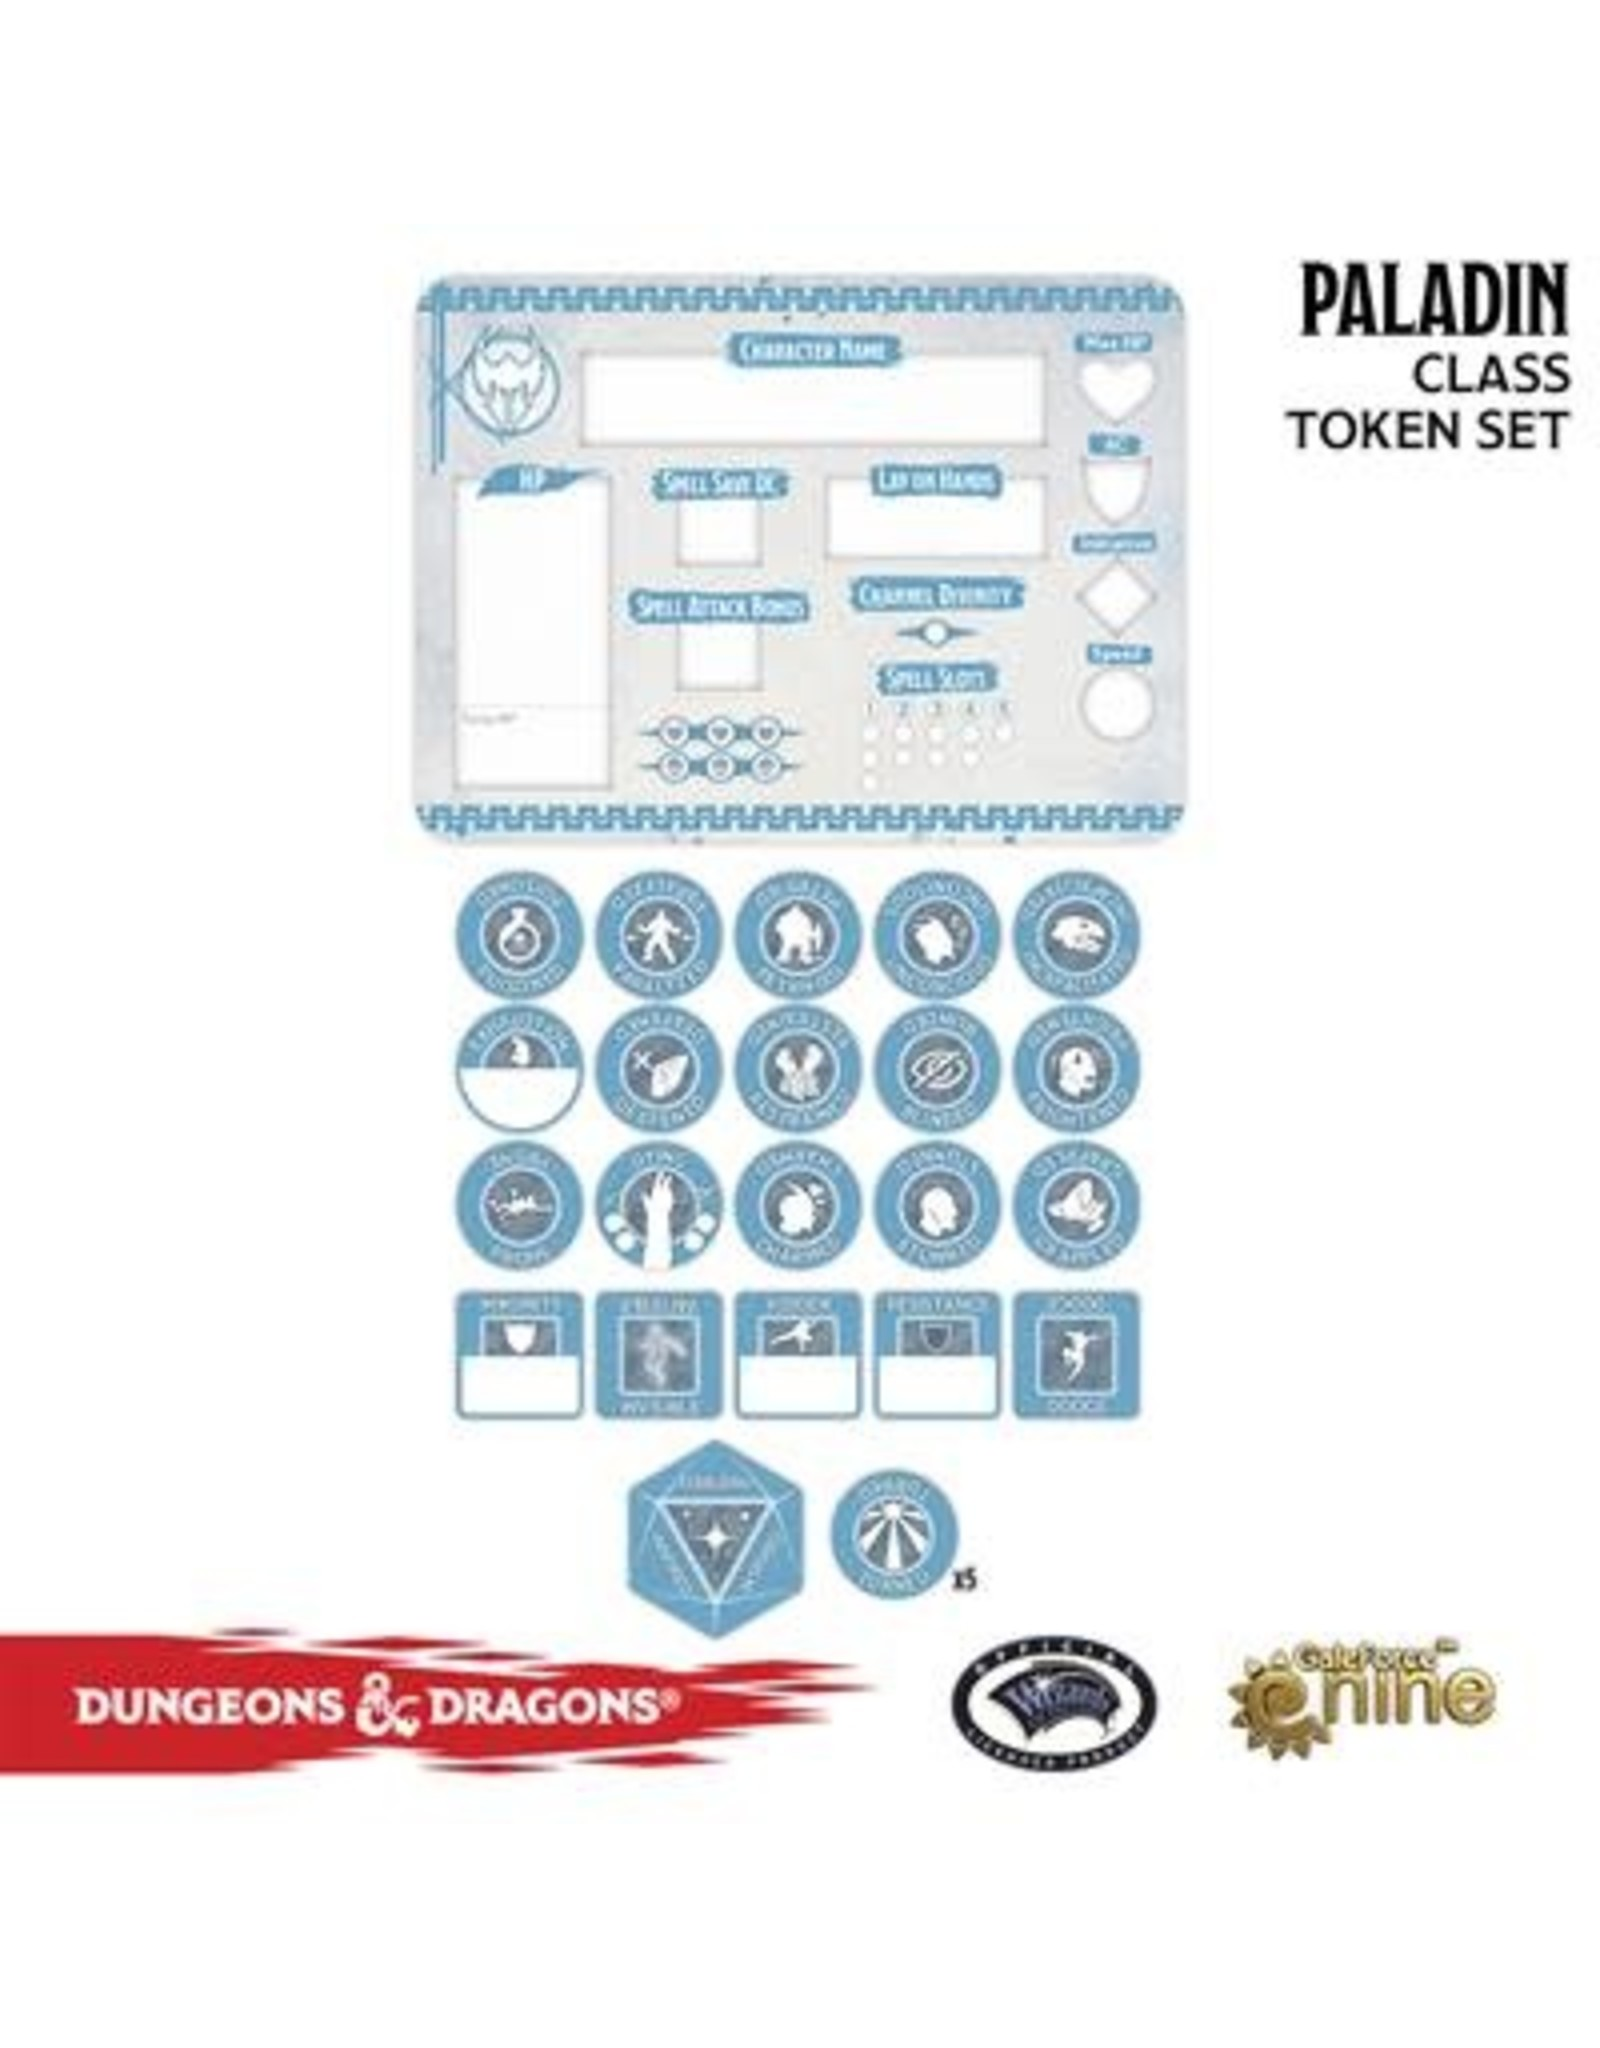 GaleForce nine D&D 5E: Player Token Set - Paladin